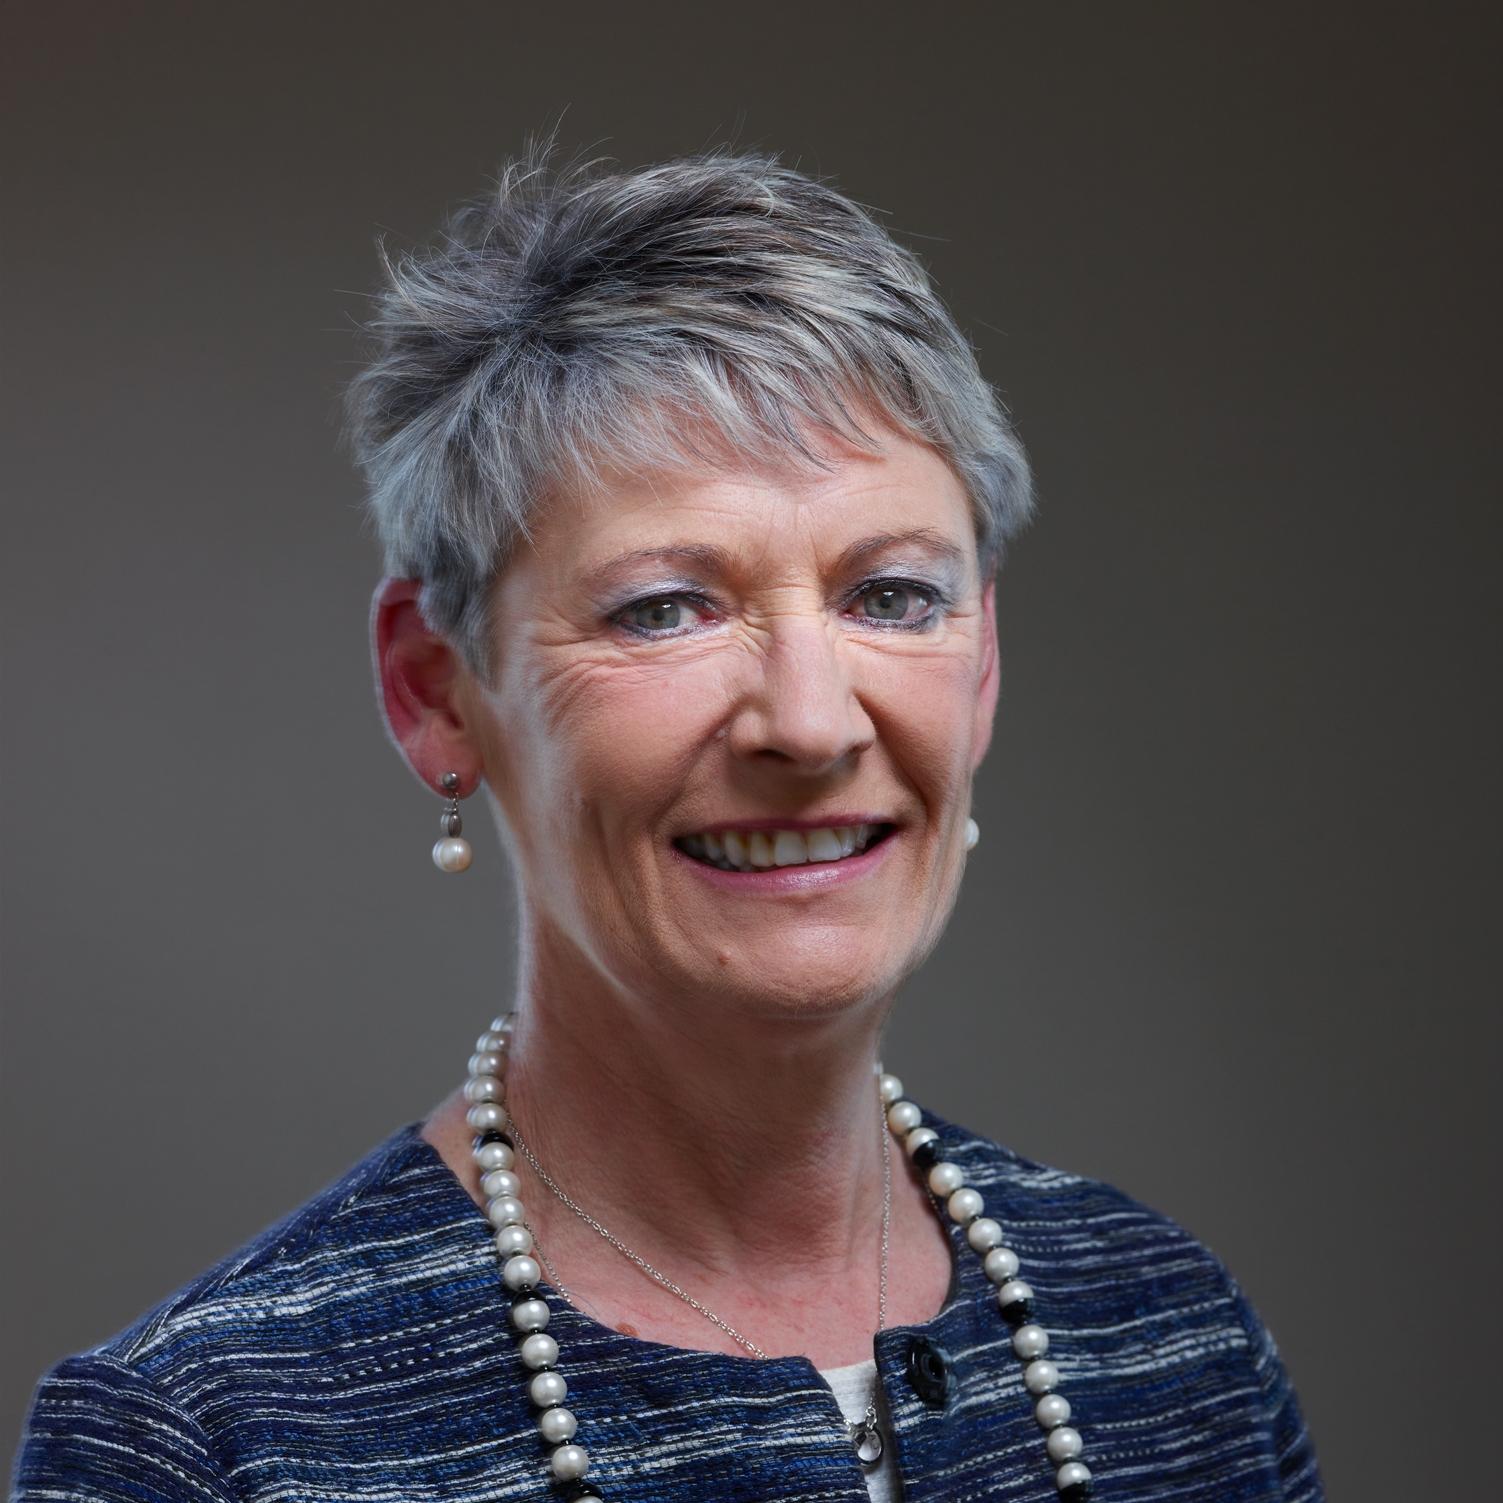 Carolyn Pillans